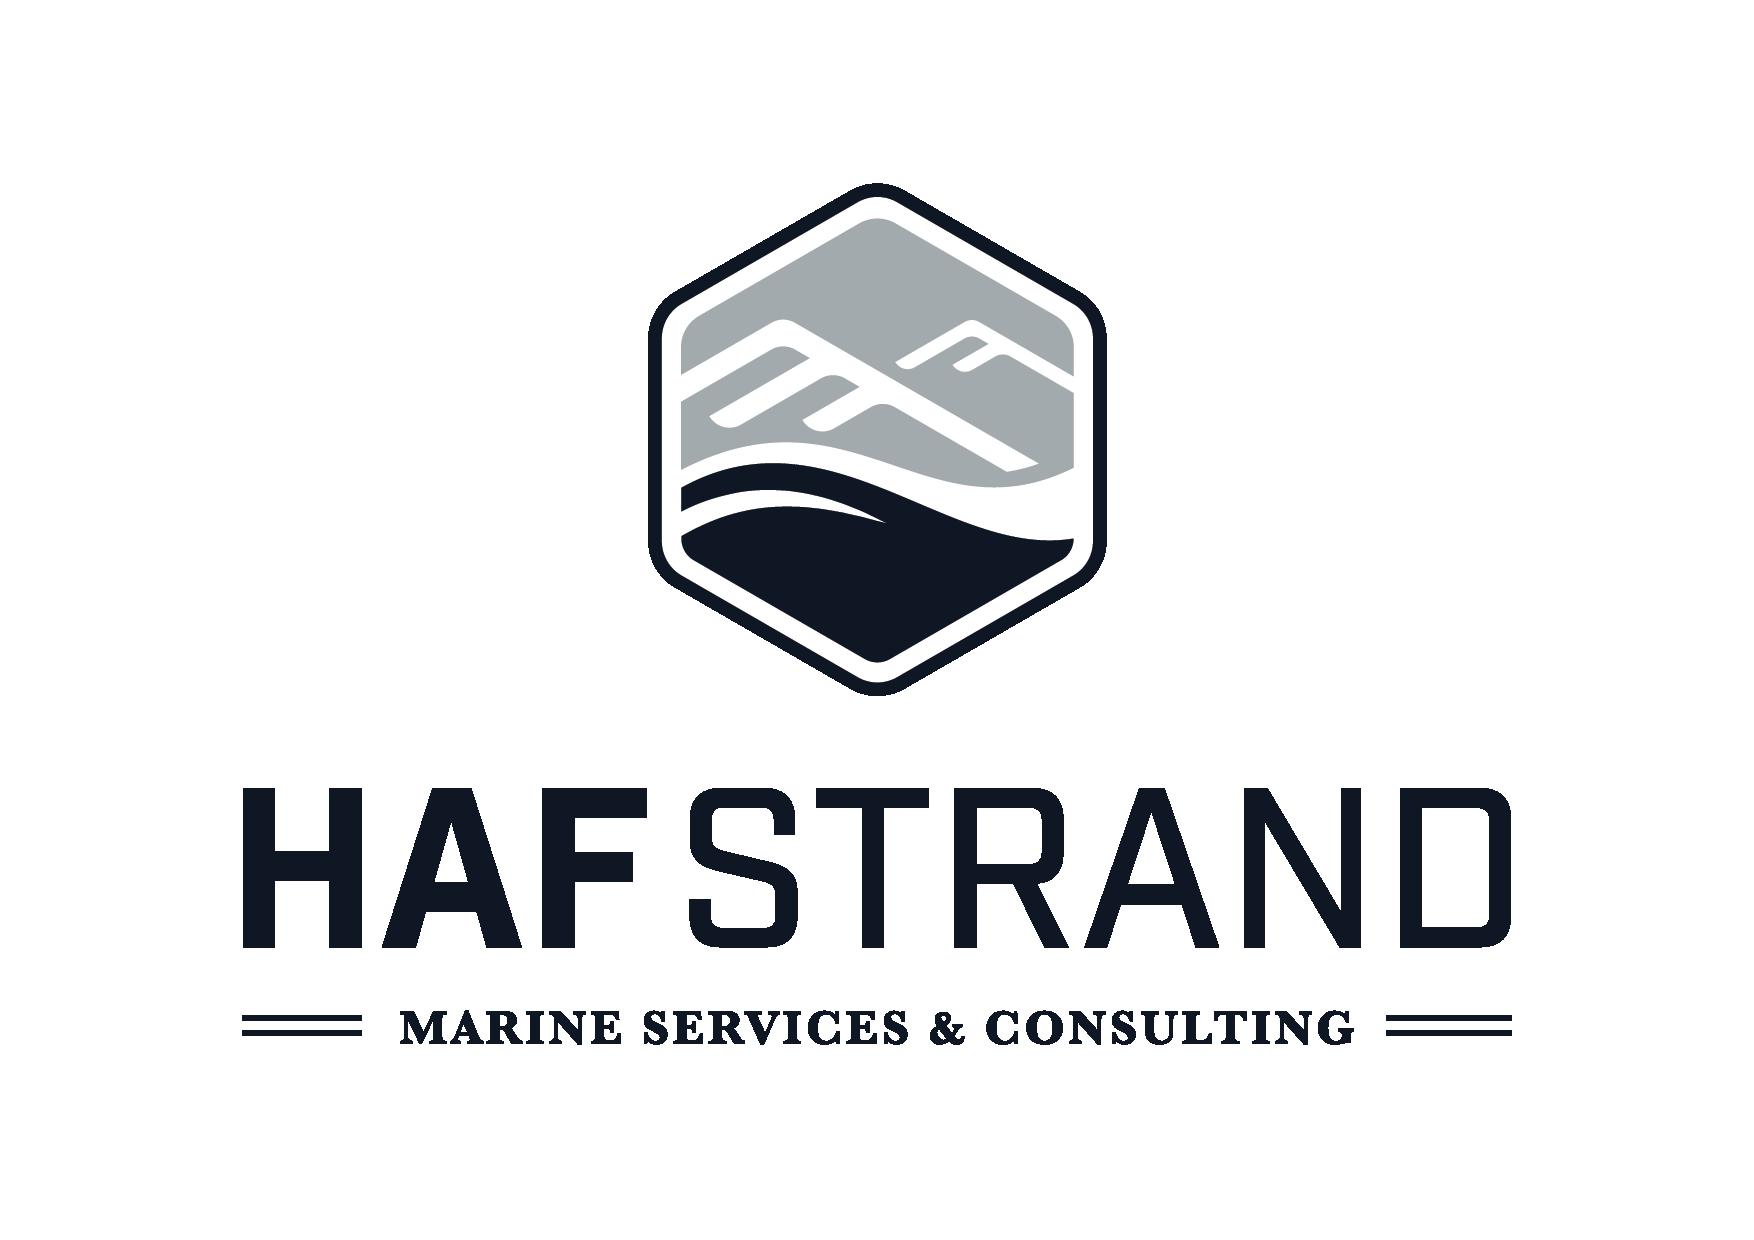 Haf-Strand_Logo-Vertical-Colour-White.png